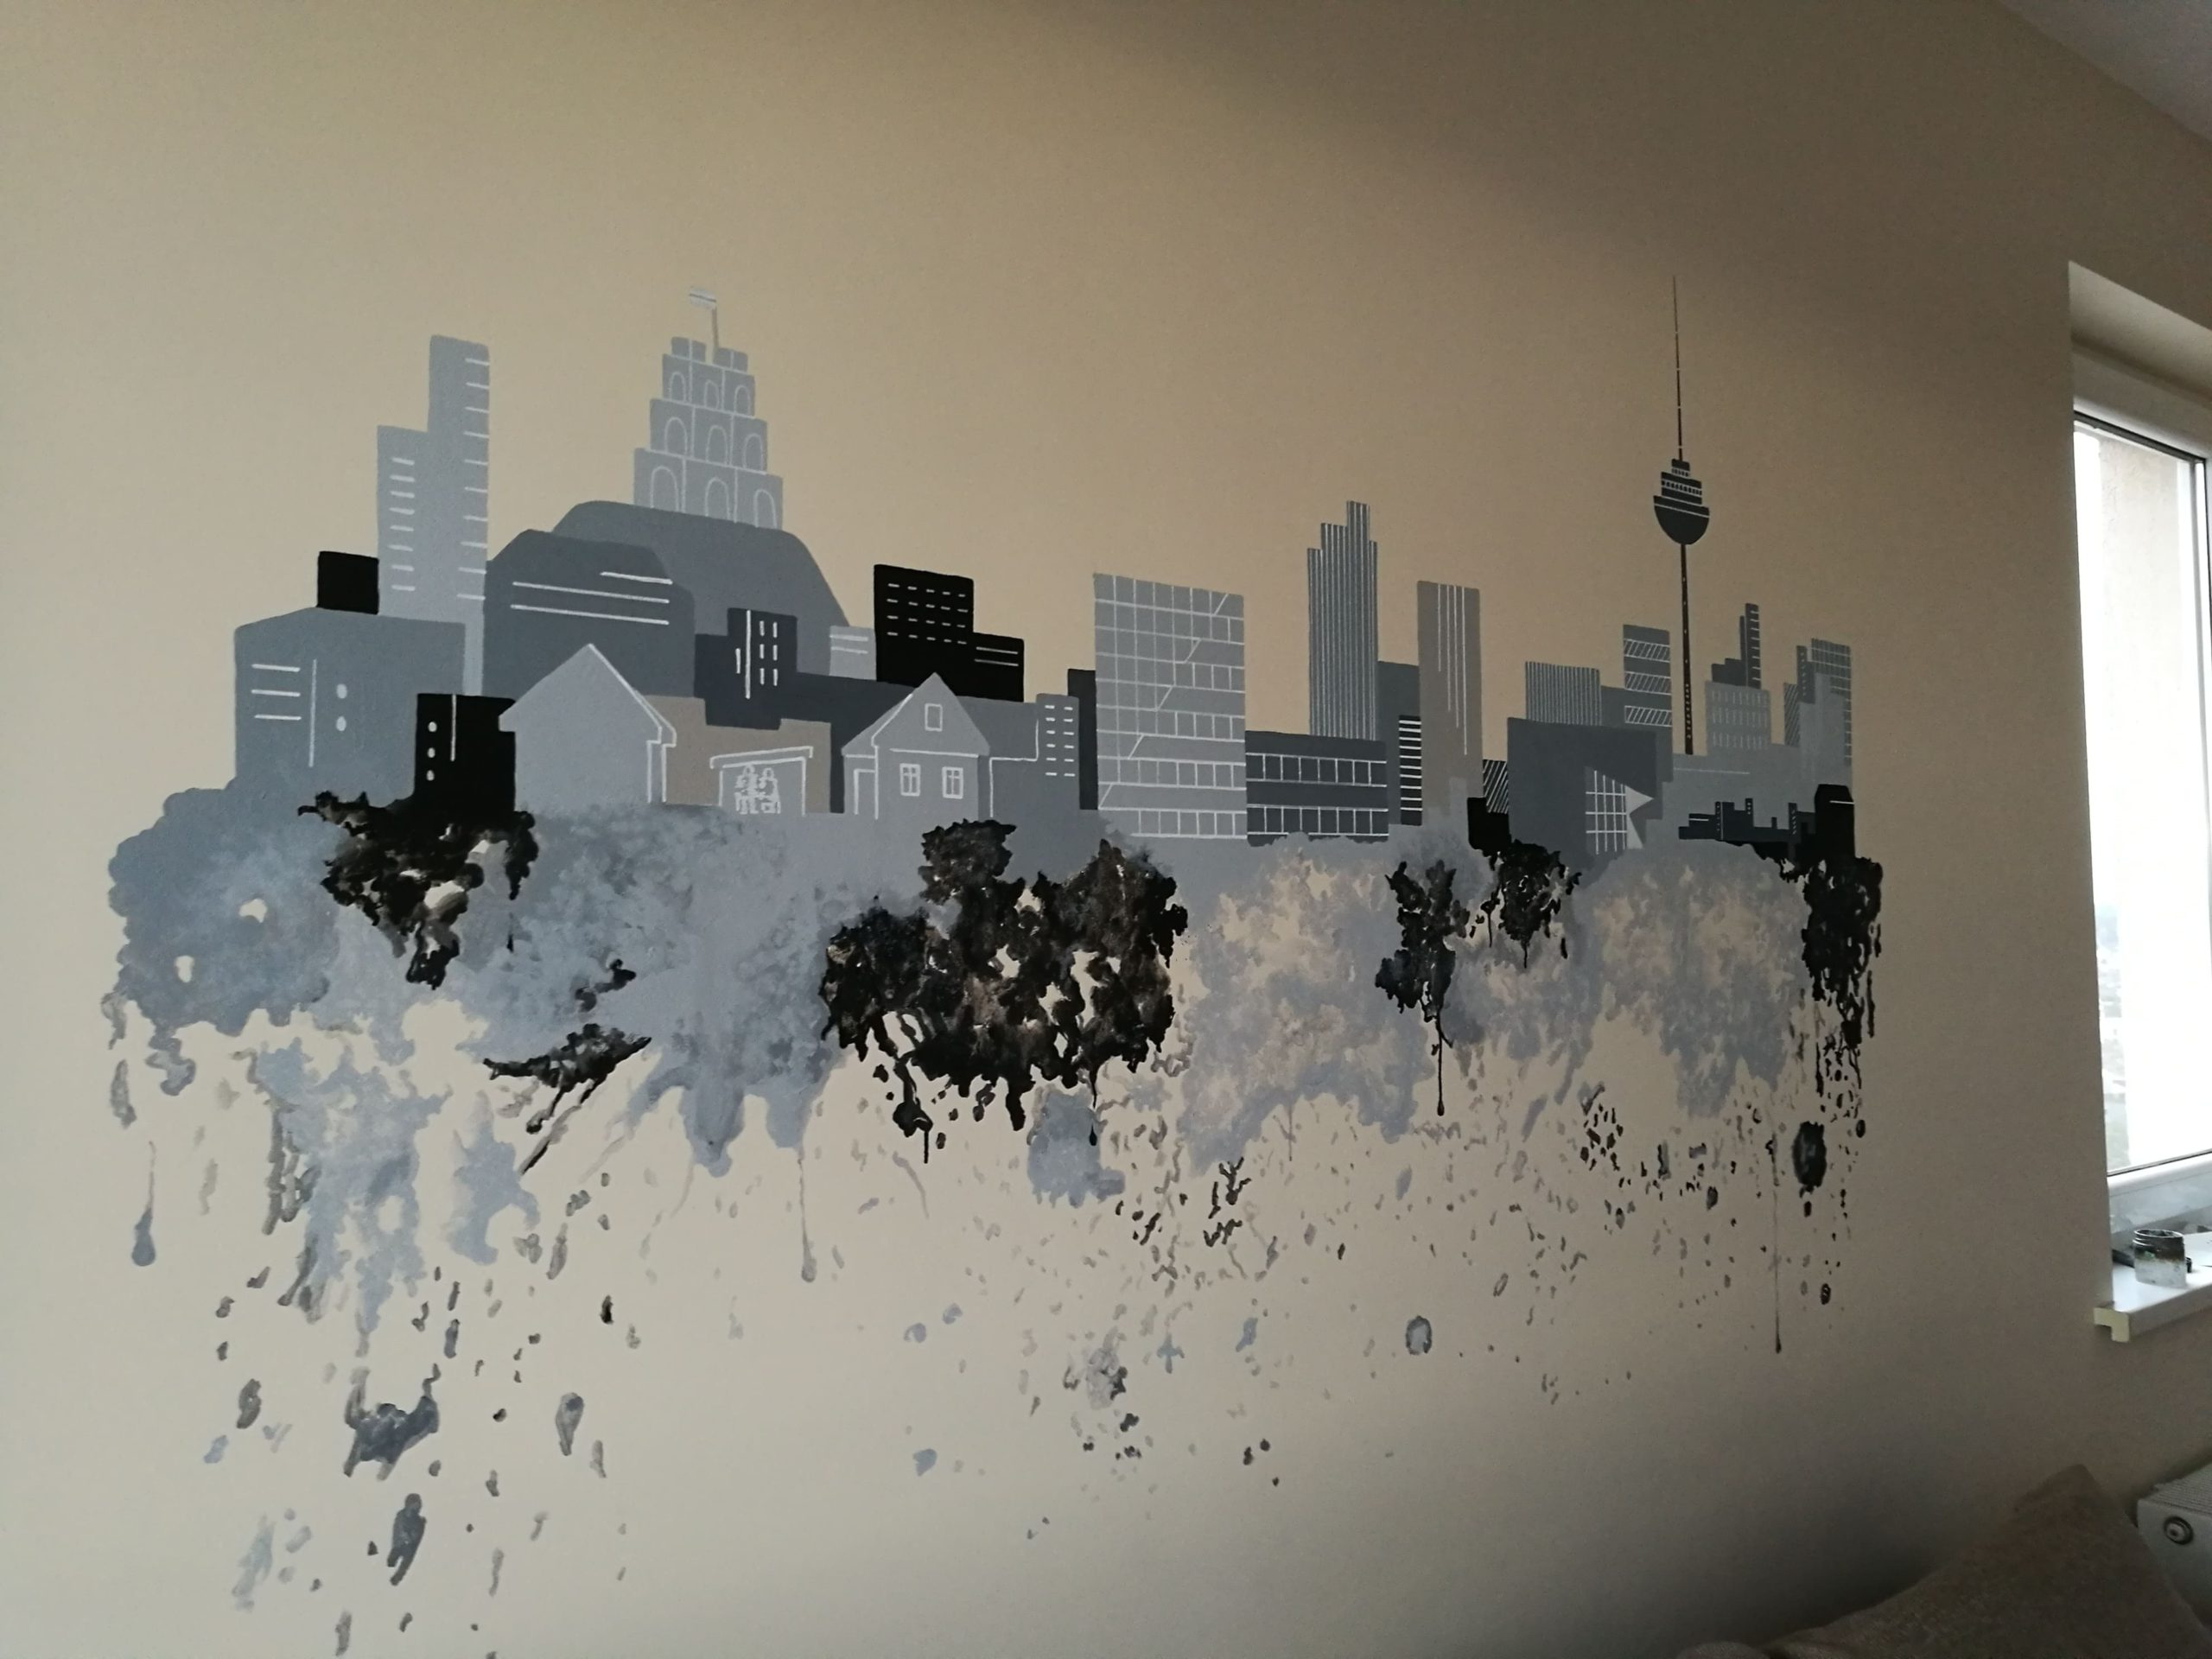 menine-kuryba-sienu-dekoravimas-ivairus-interjerai (18)